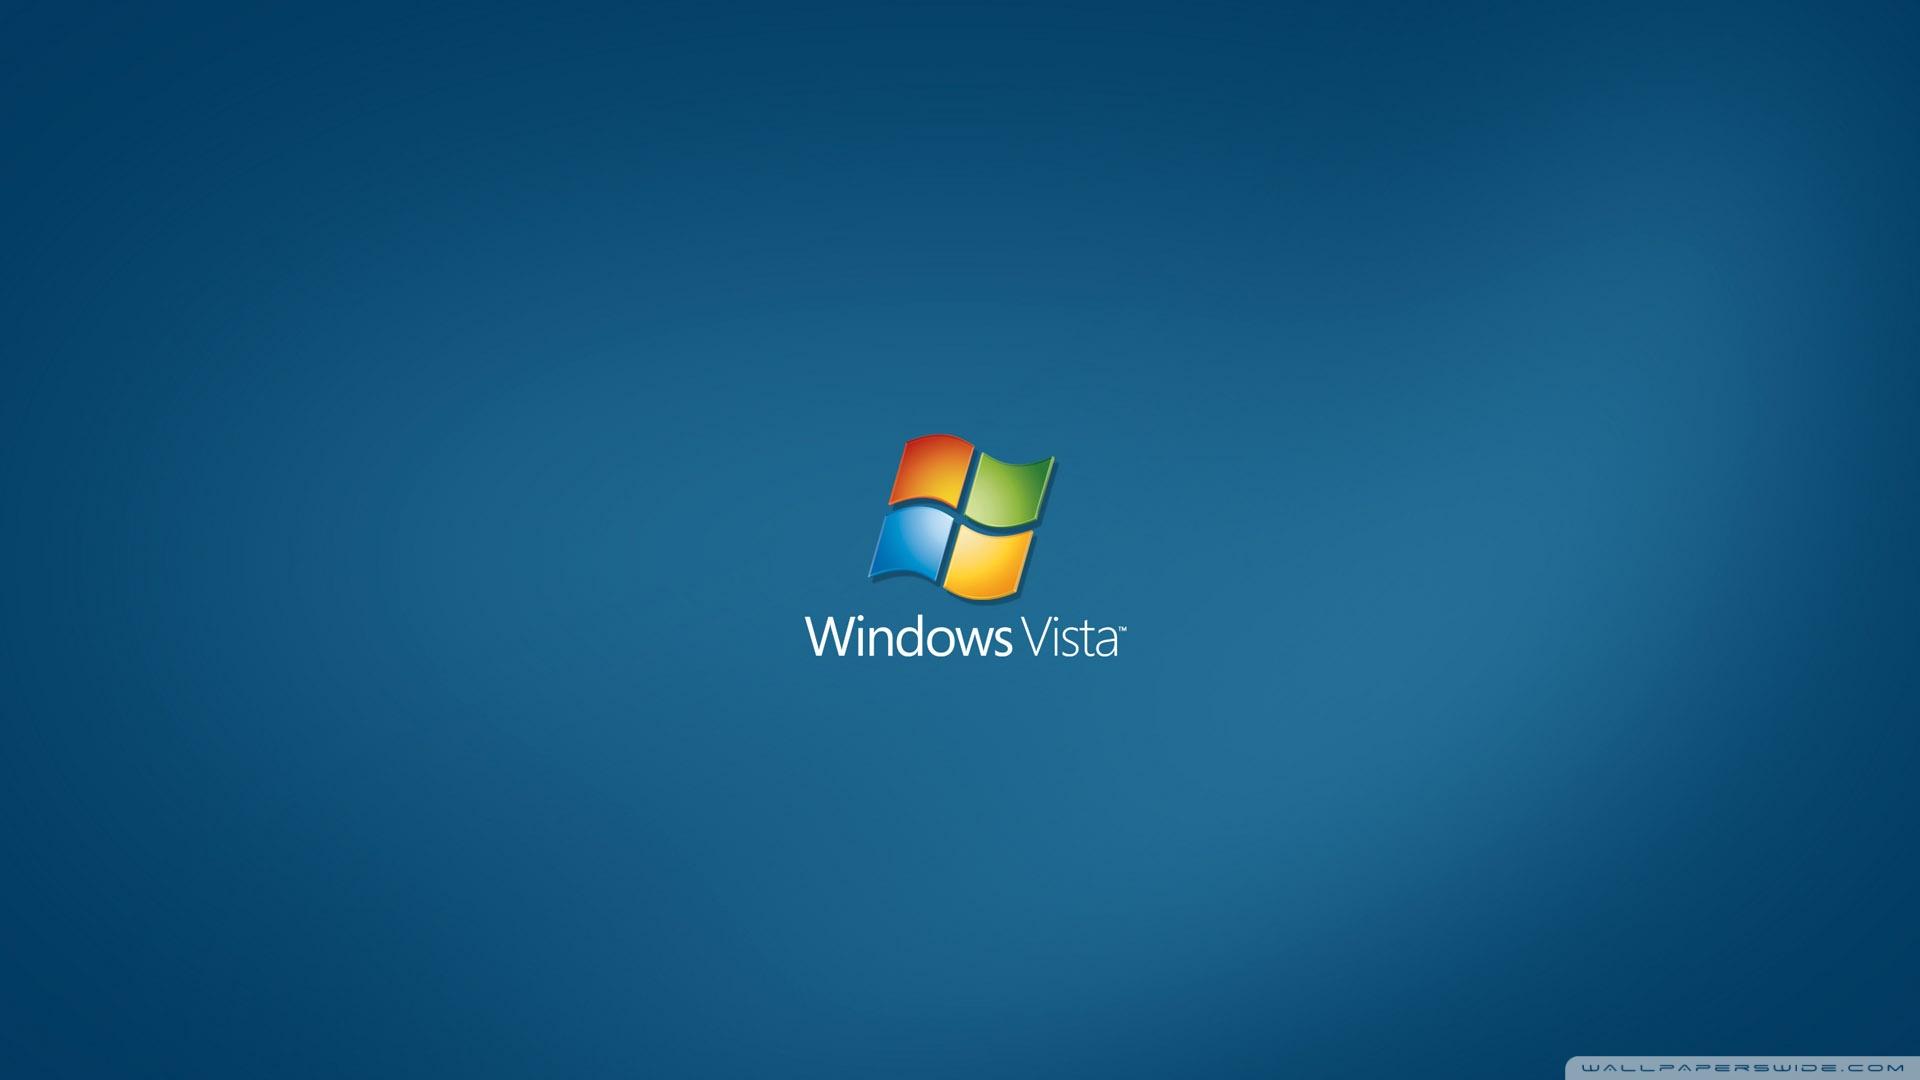 Windows 7 Aero Wallpaper 1920x1080